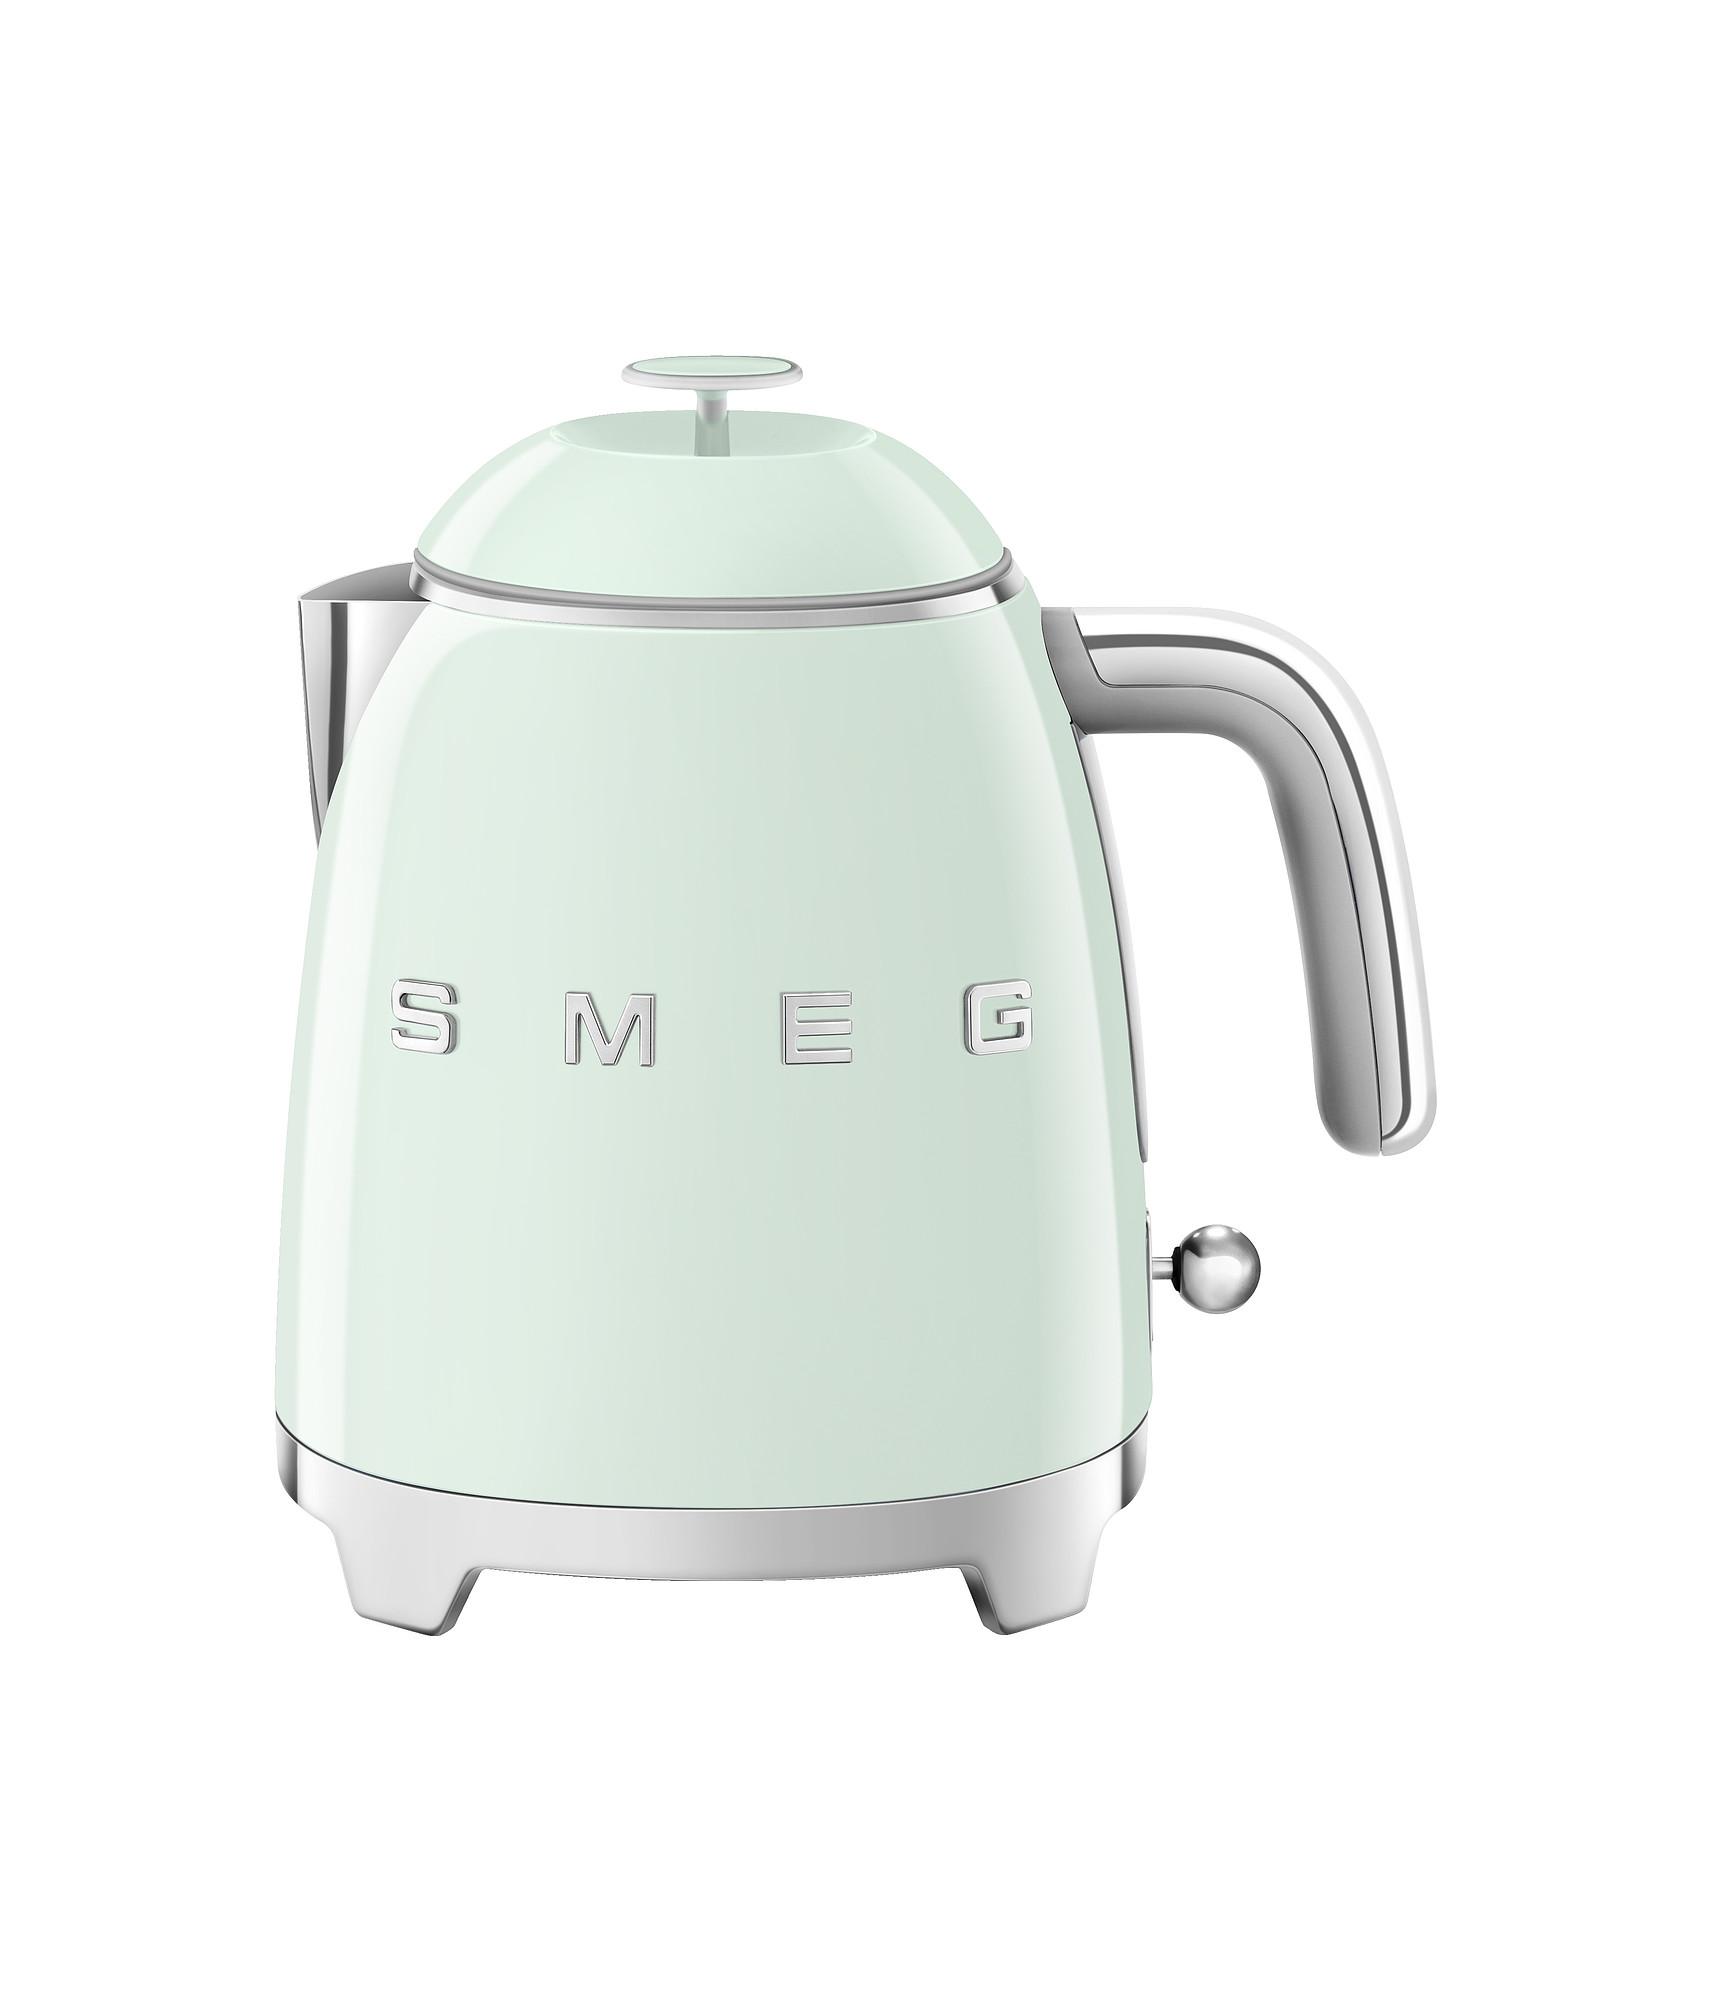 SMEG Mini Wasserkocher Pastellgrün